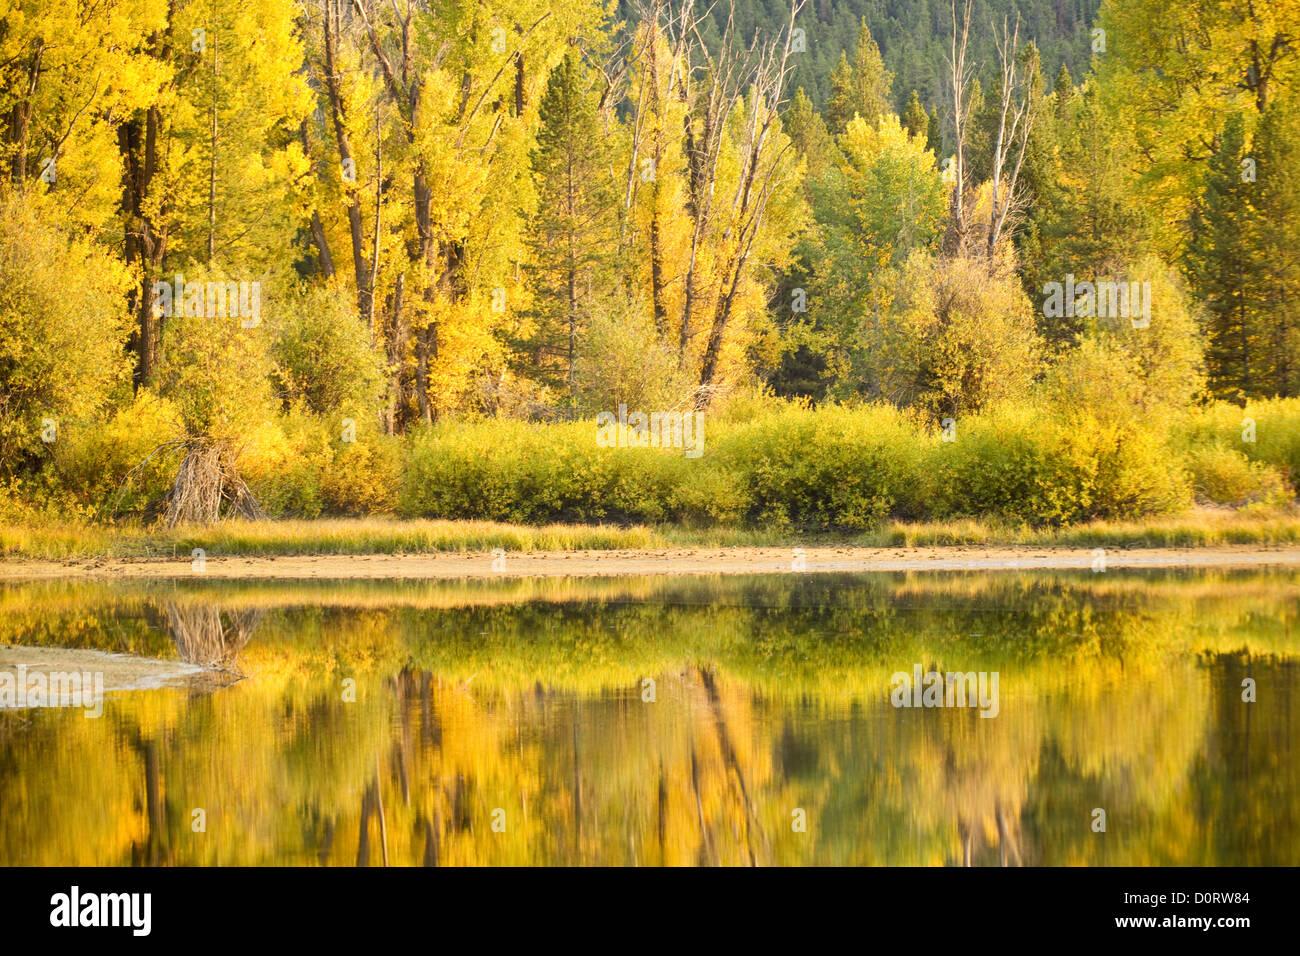 On Golden Pond - Stock Image